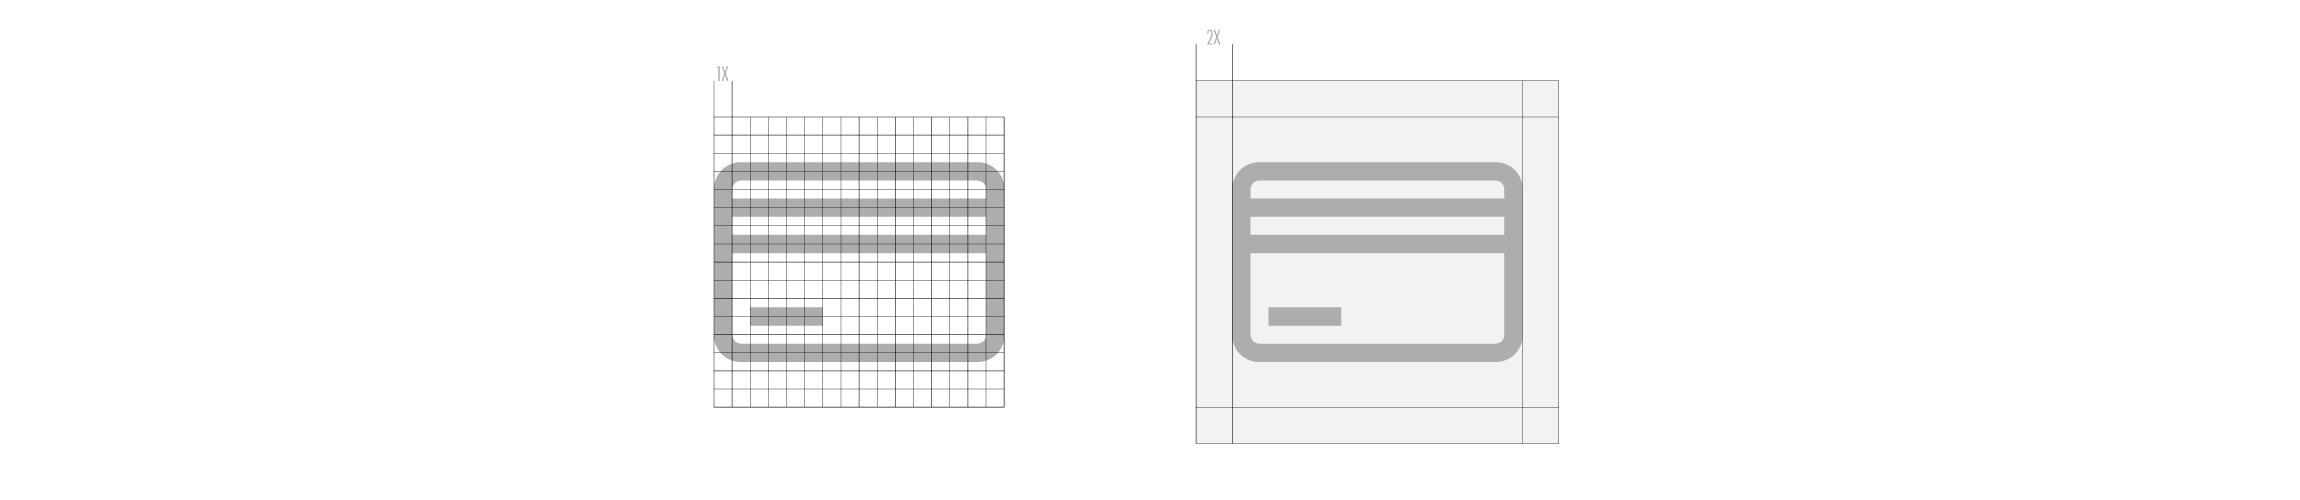 grid_icons